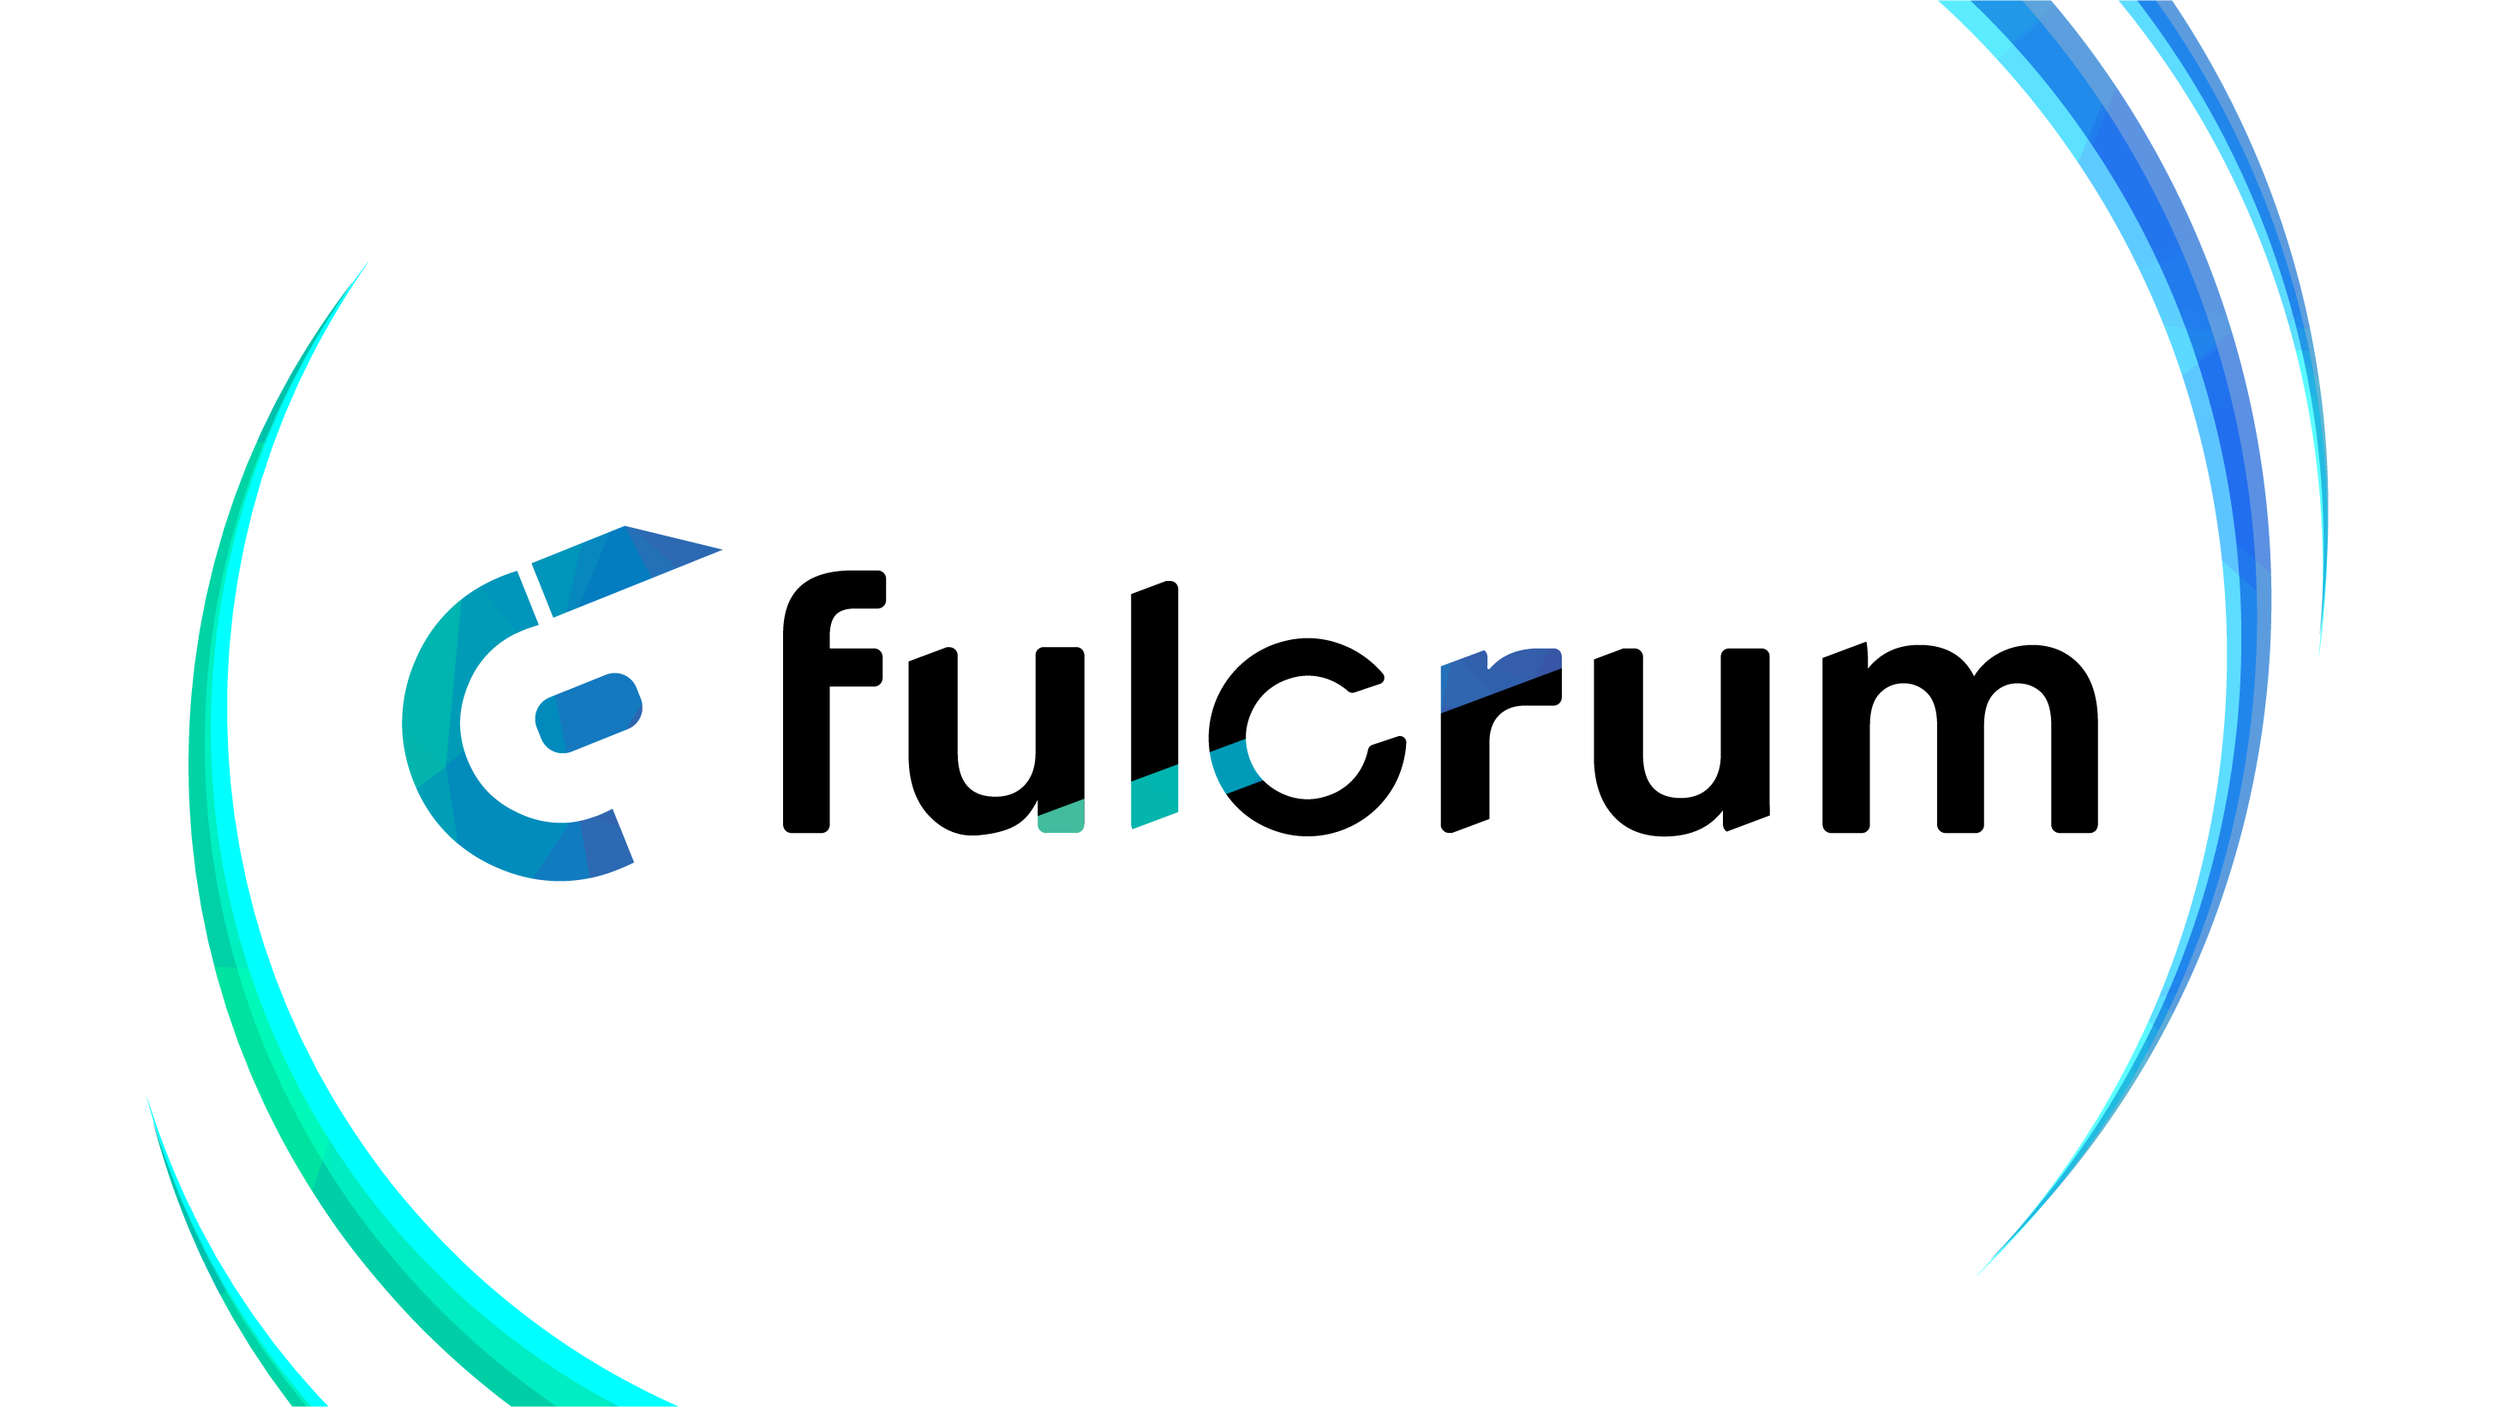 fulcrum-header.png